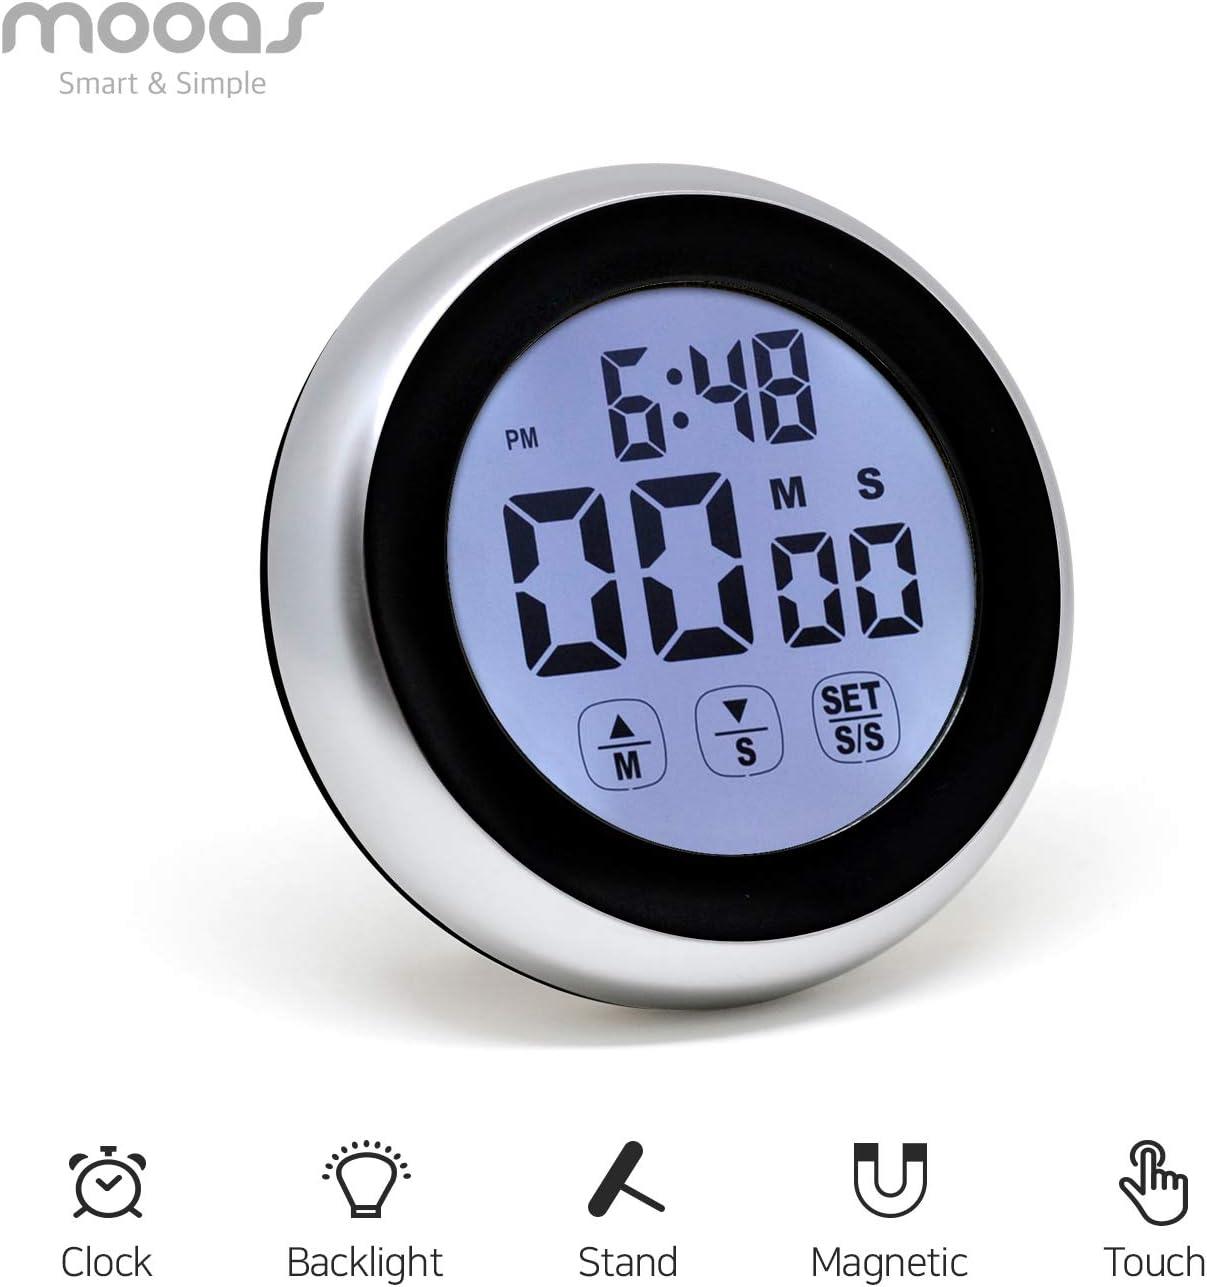 Mooas LED Digital Cooking Timer TC2, kitchen timer,stop watch, alarm clock, alarm cooking timer (Black)